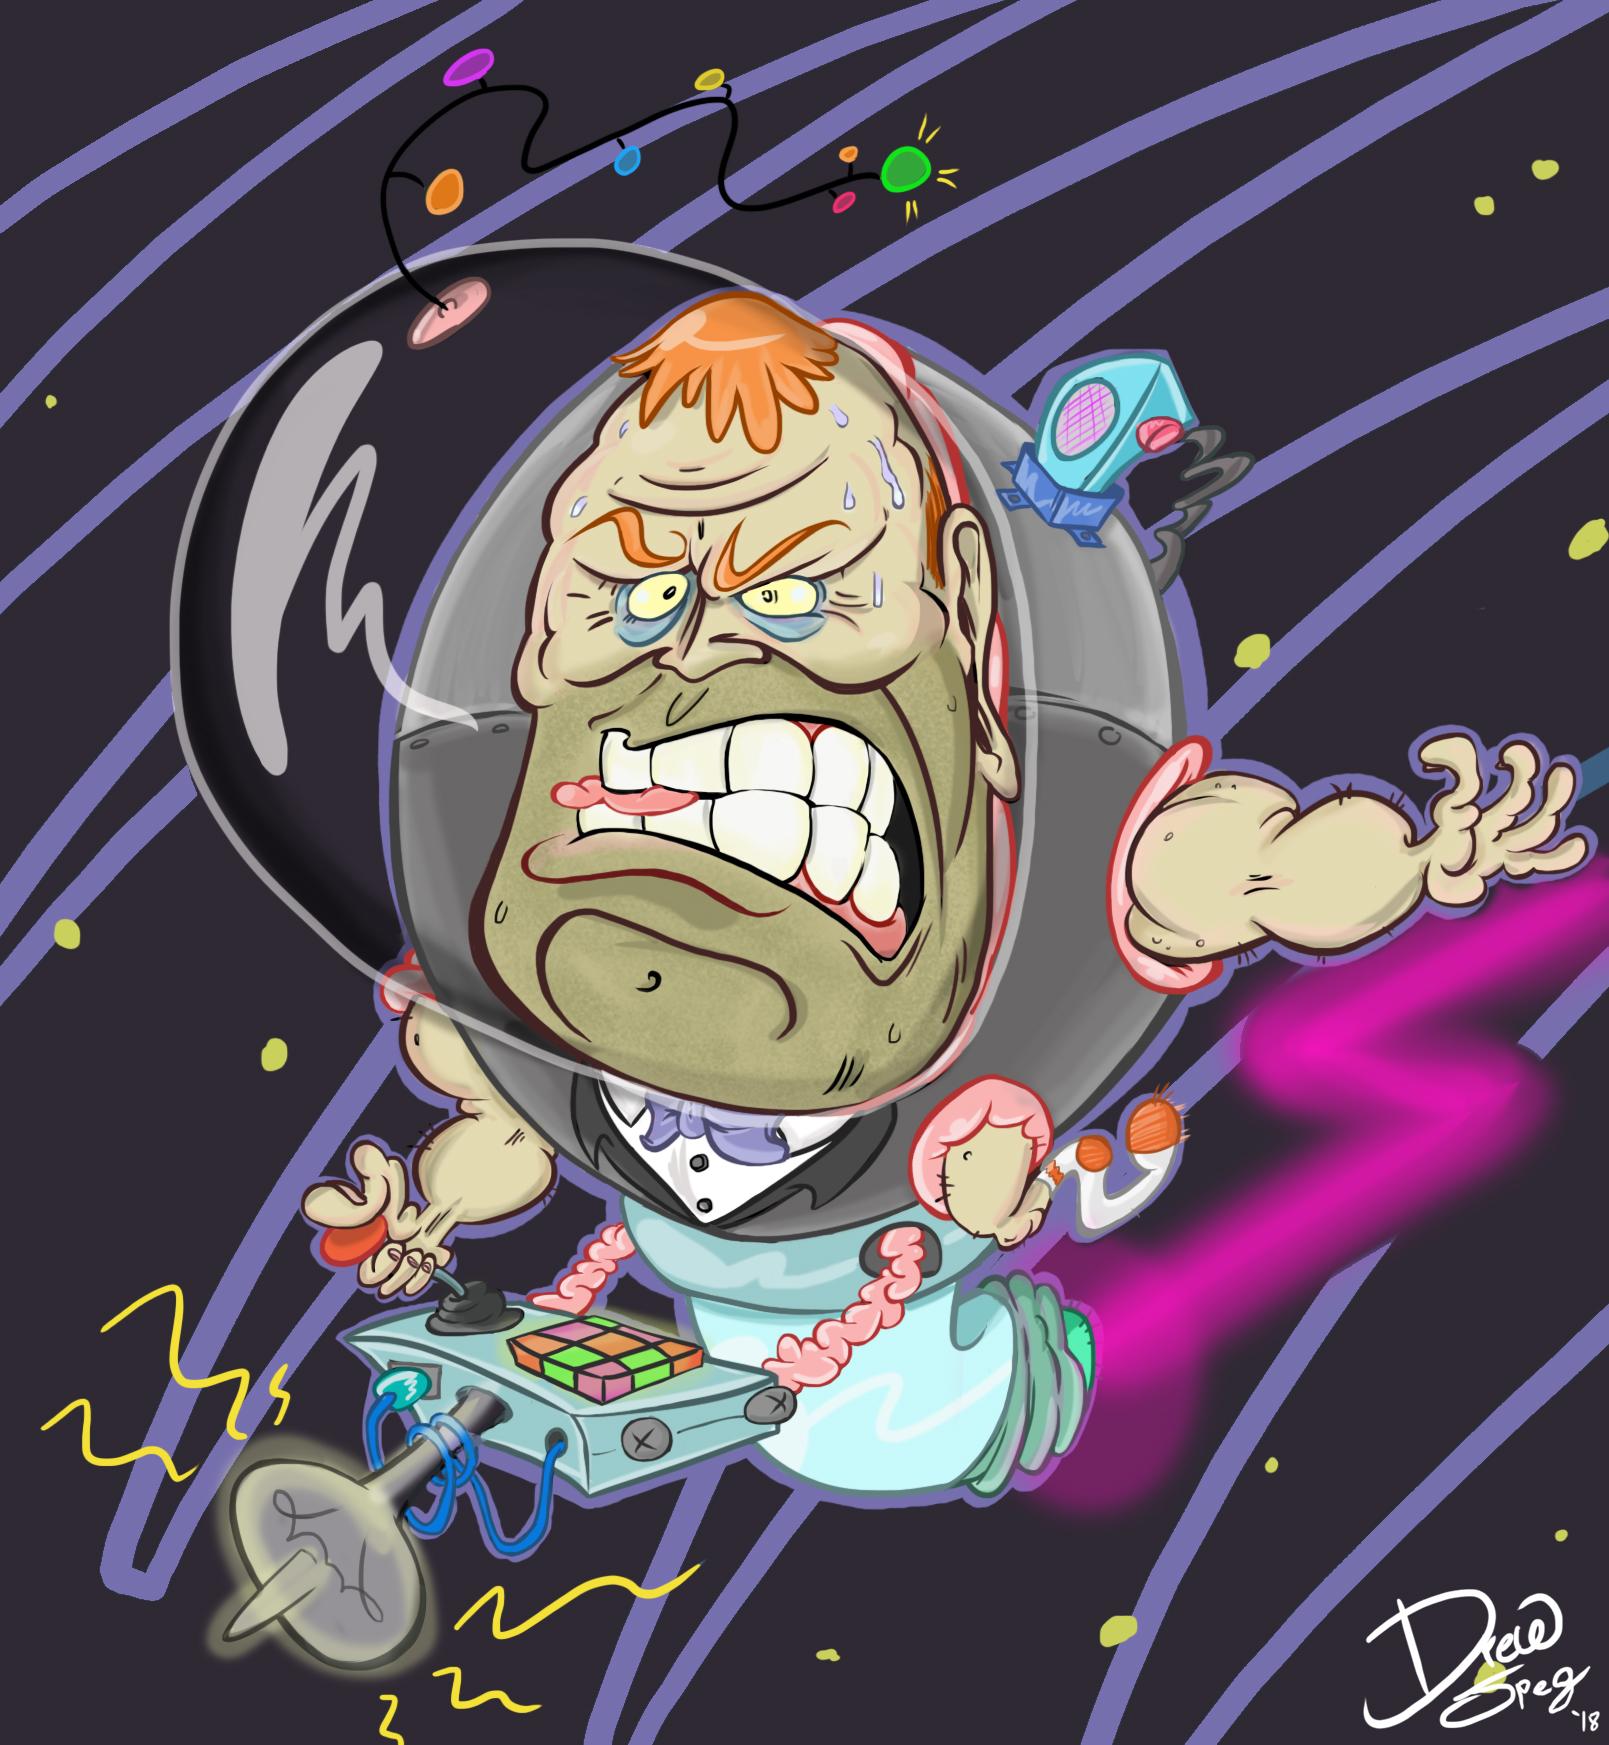 Space Man Steve